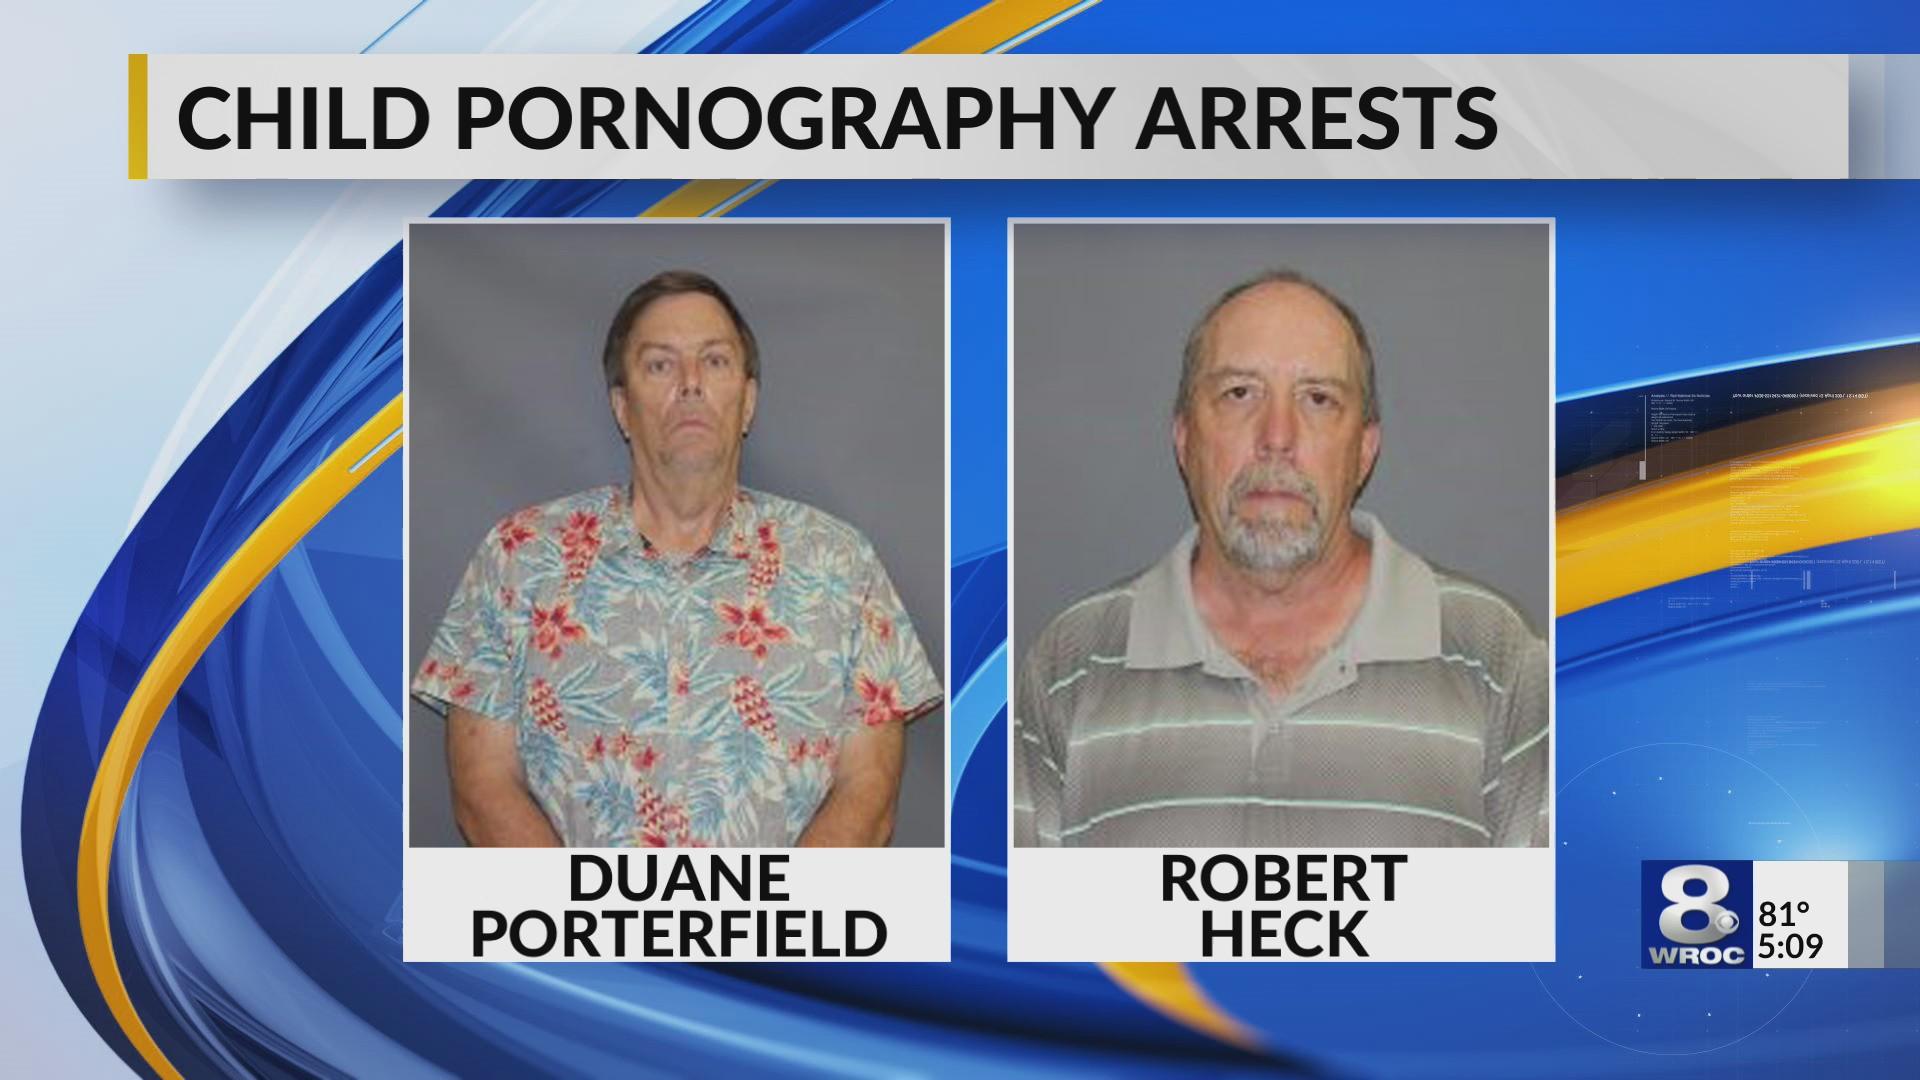 amatuer-interracial-pornography-arrests